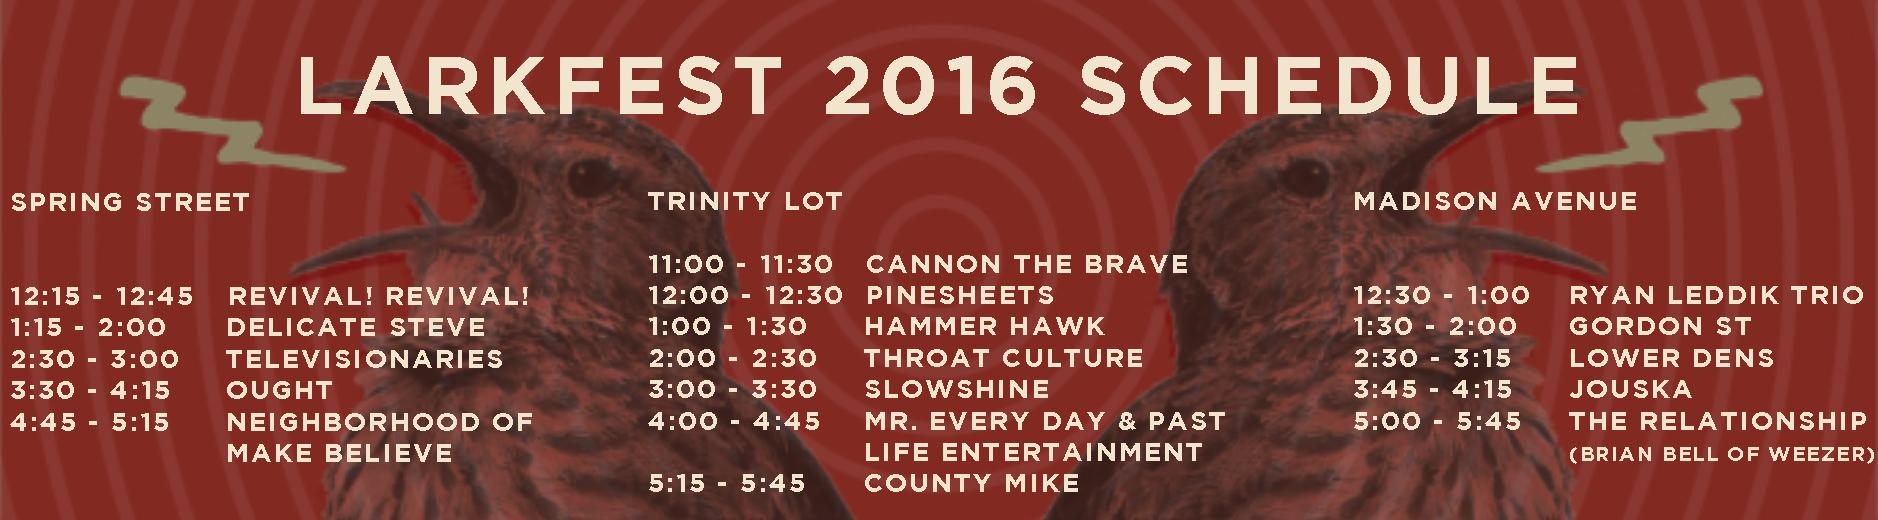 larkfest2016schedule